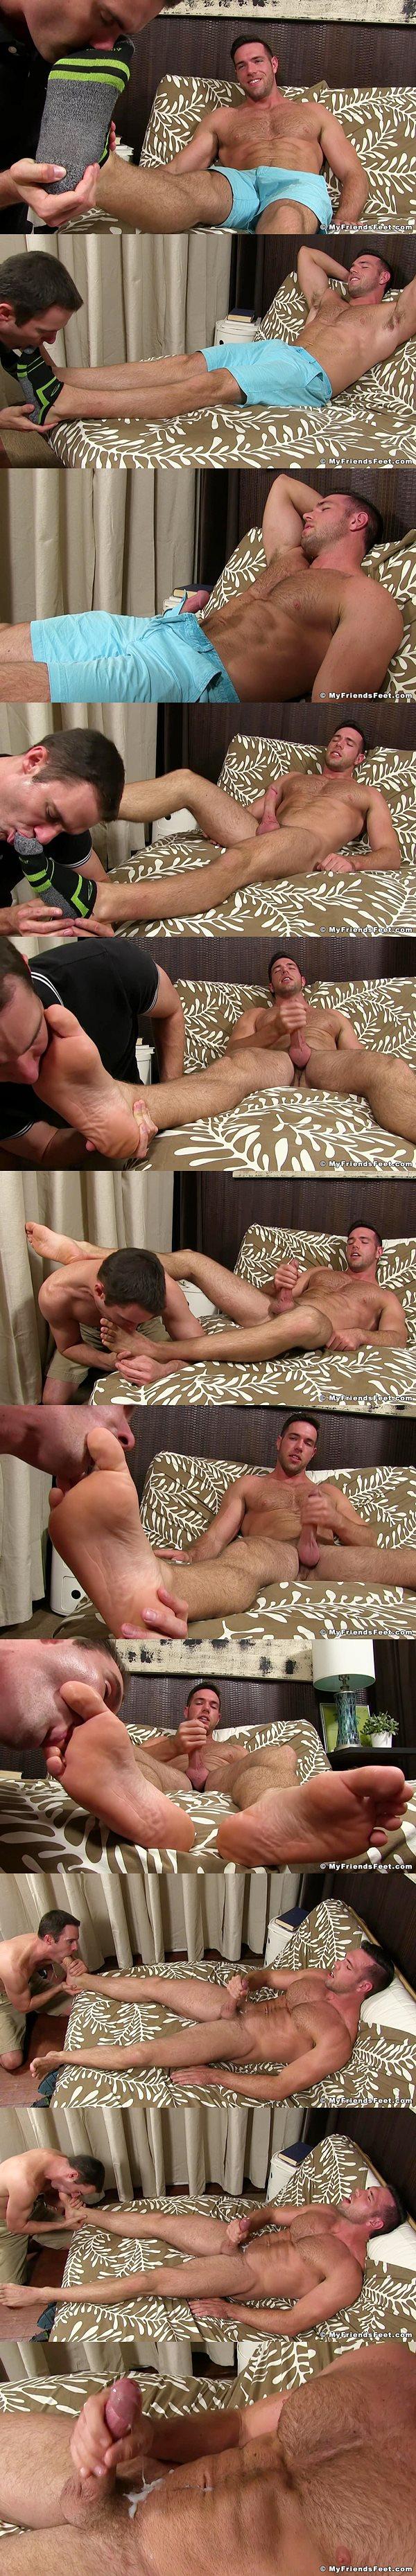 Myfriendsfeet - Alex Mecum Foot Serviced by Cameron Kincade 02